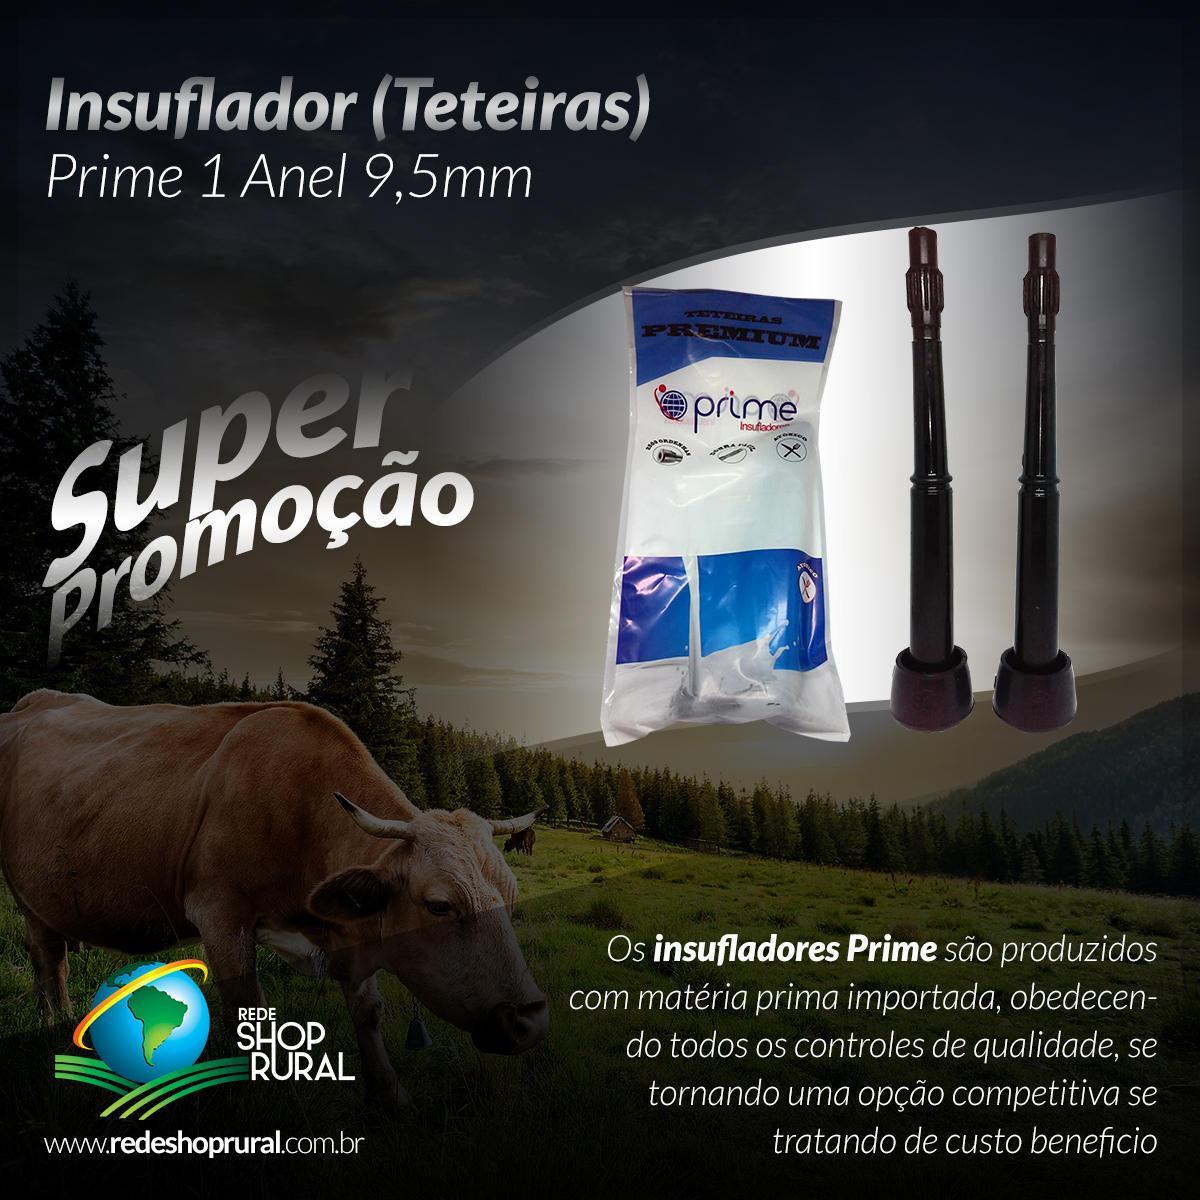 Insuflador (Teteiras) Prime 1 Anel 9,5mm